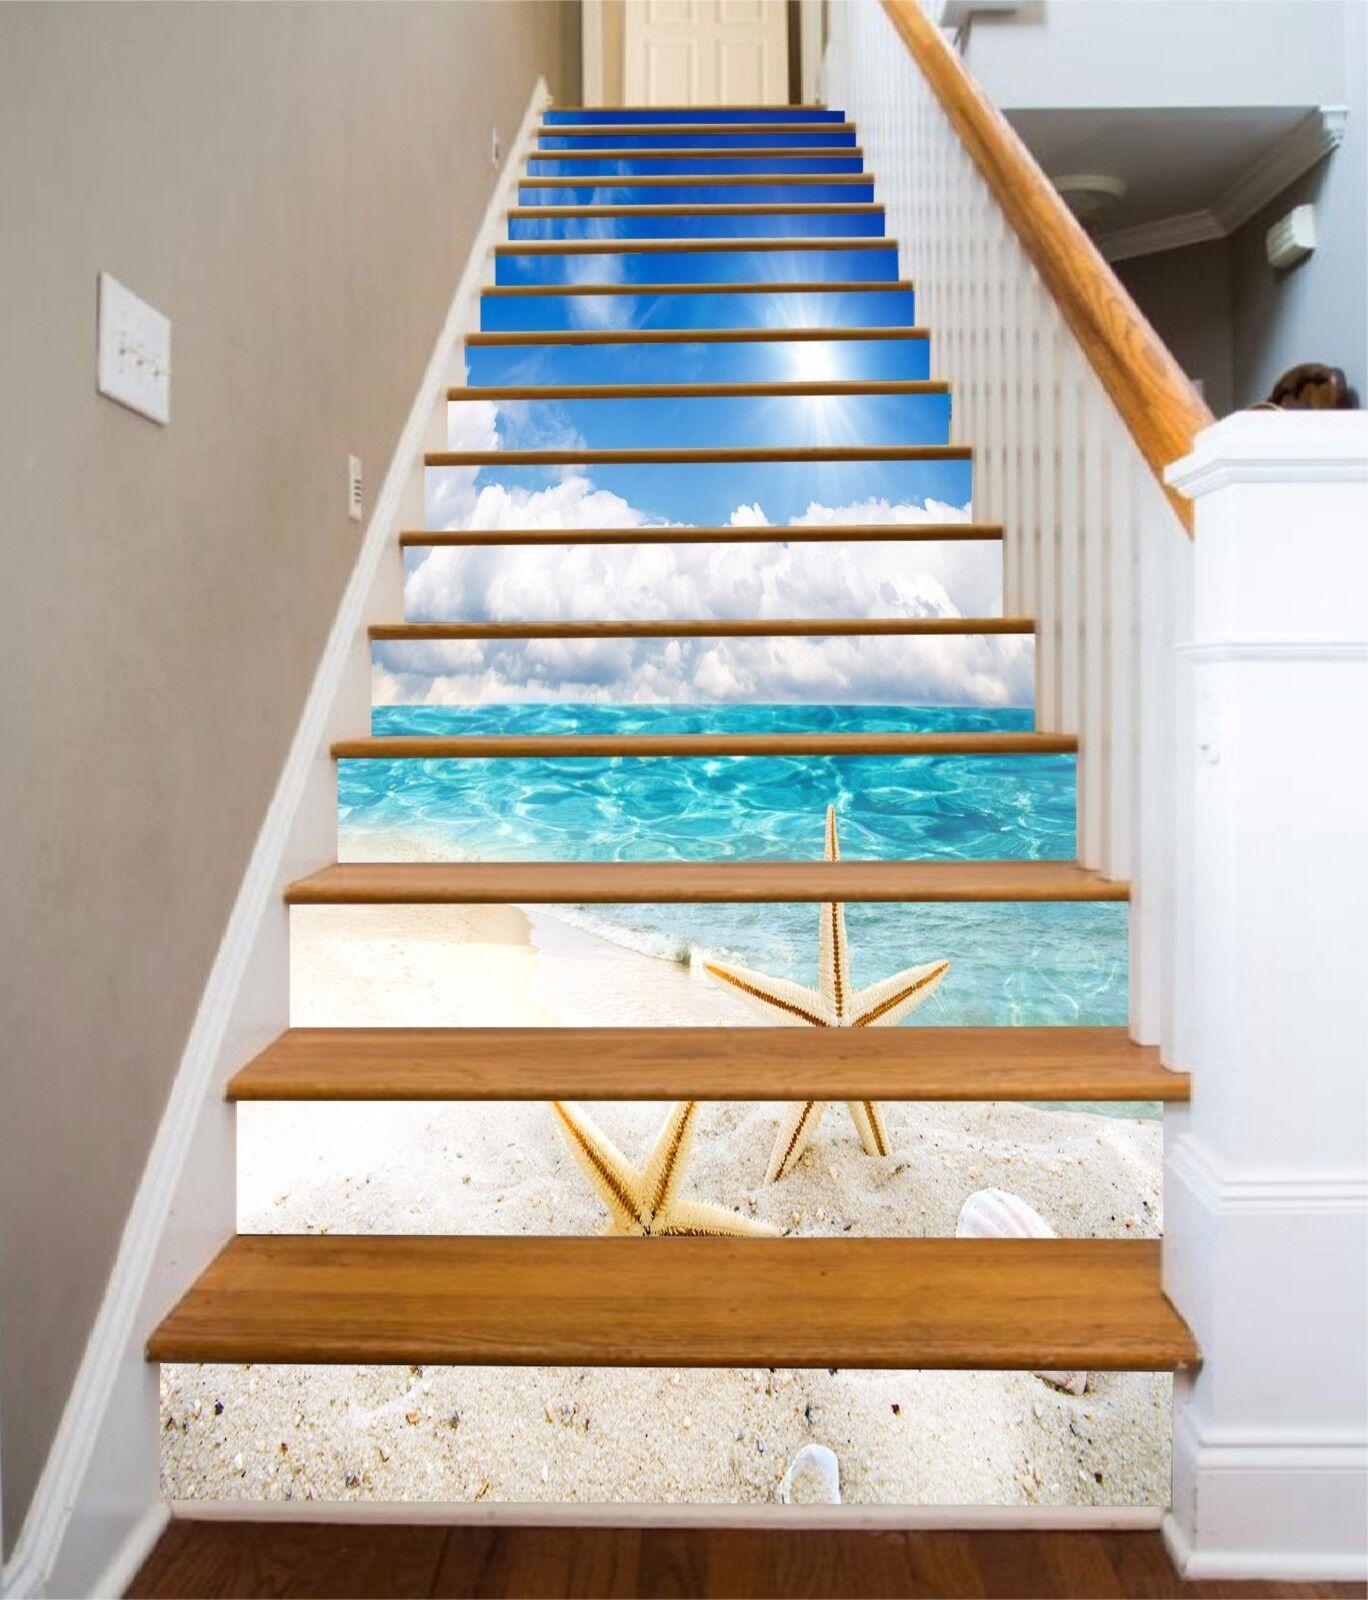 3D Starfish Beach Stairs Risers Decoration Photo Mural Vinyl Decal WandPapier US